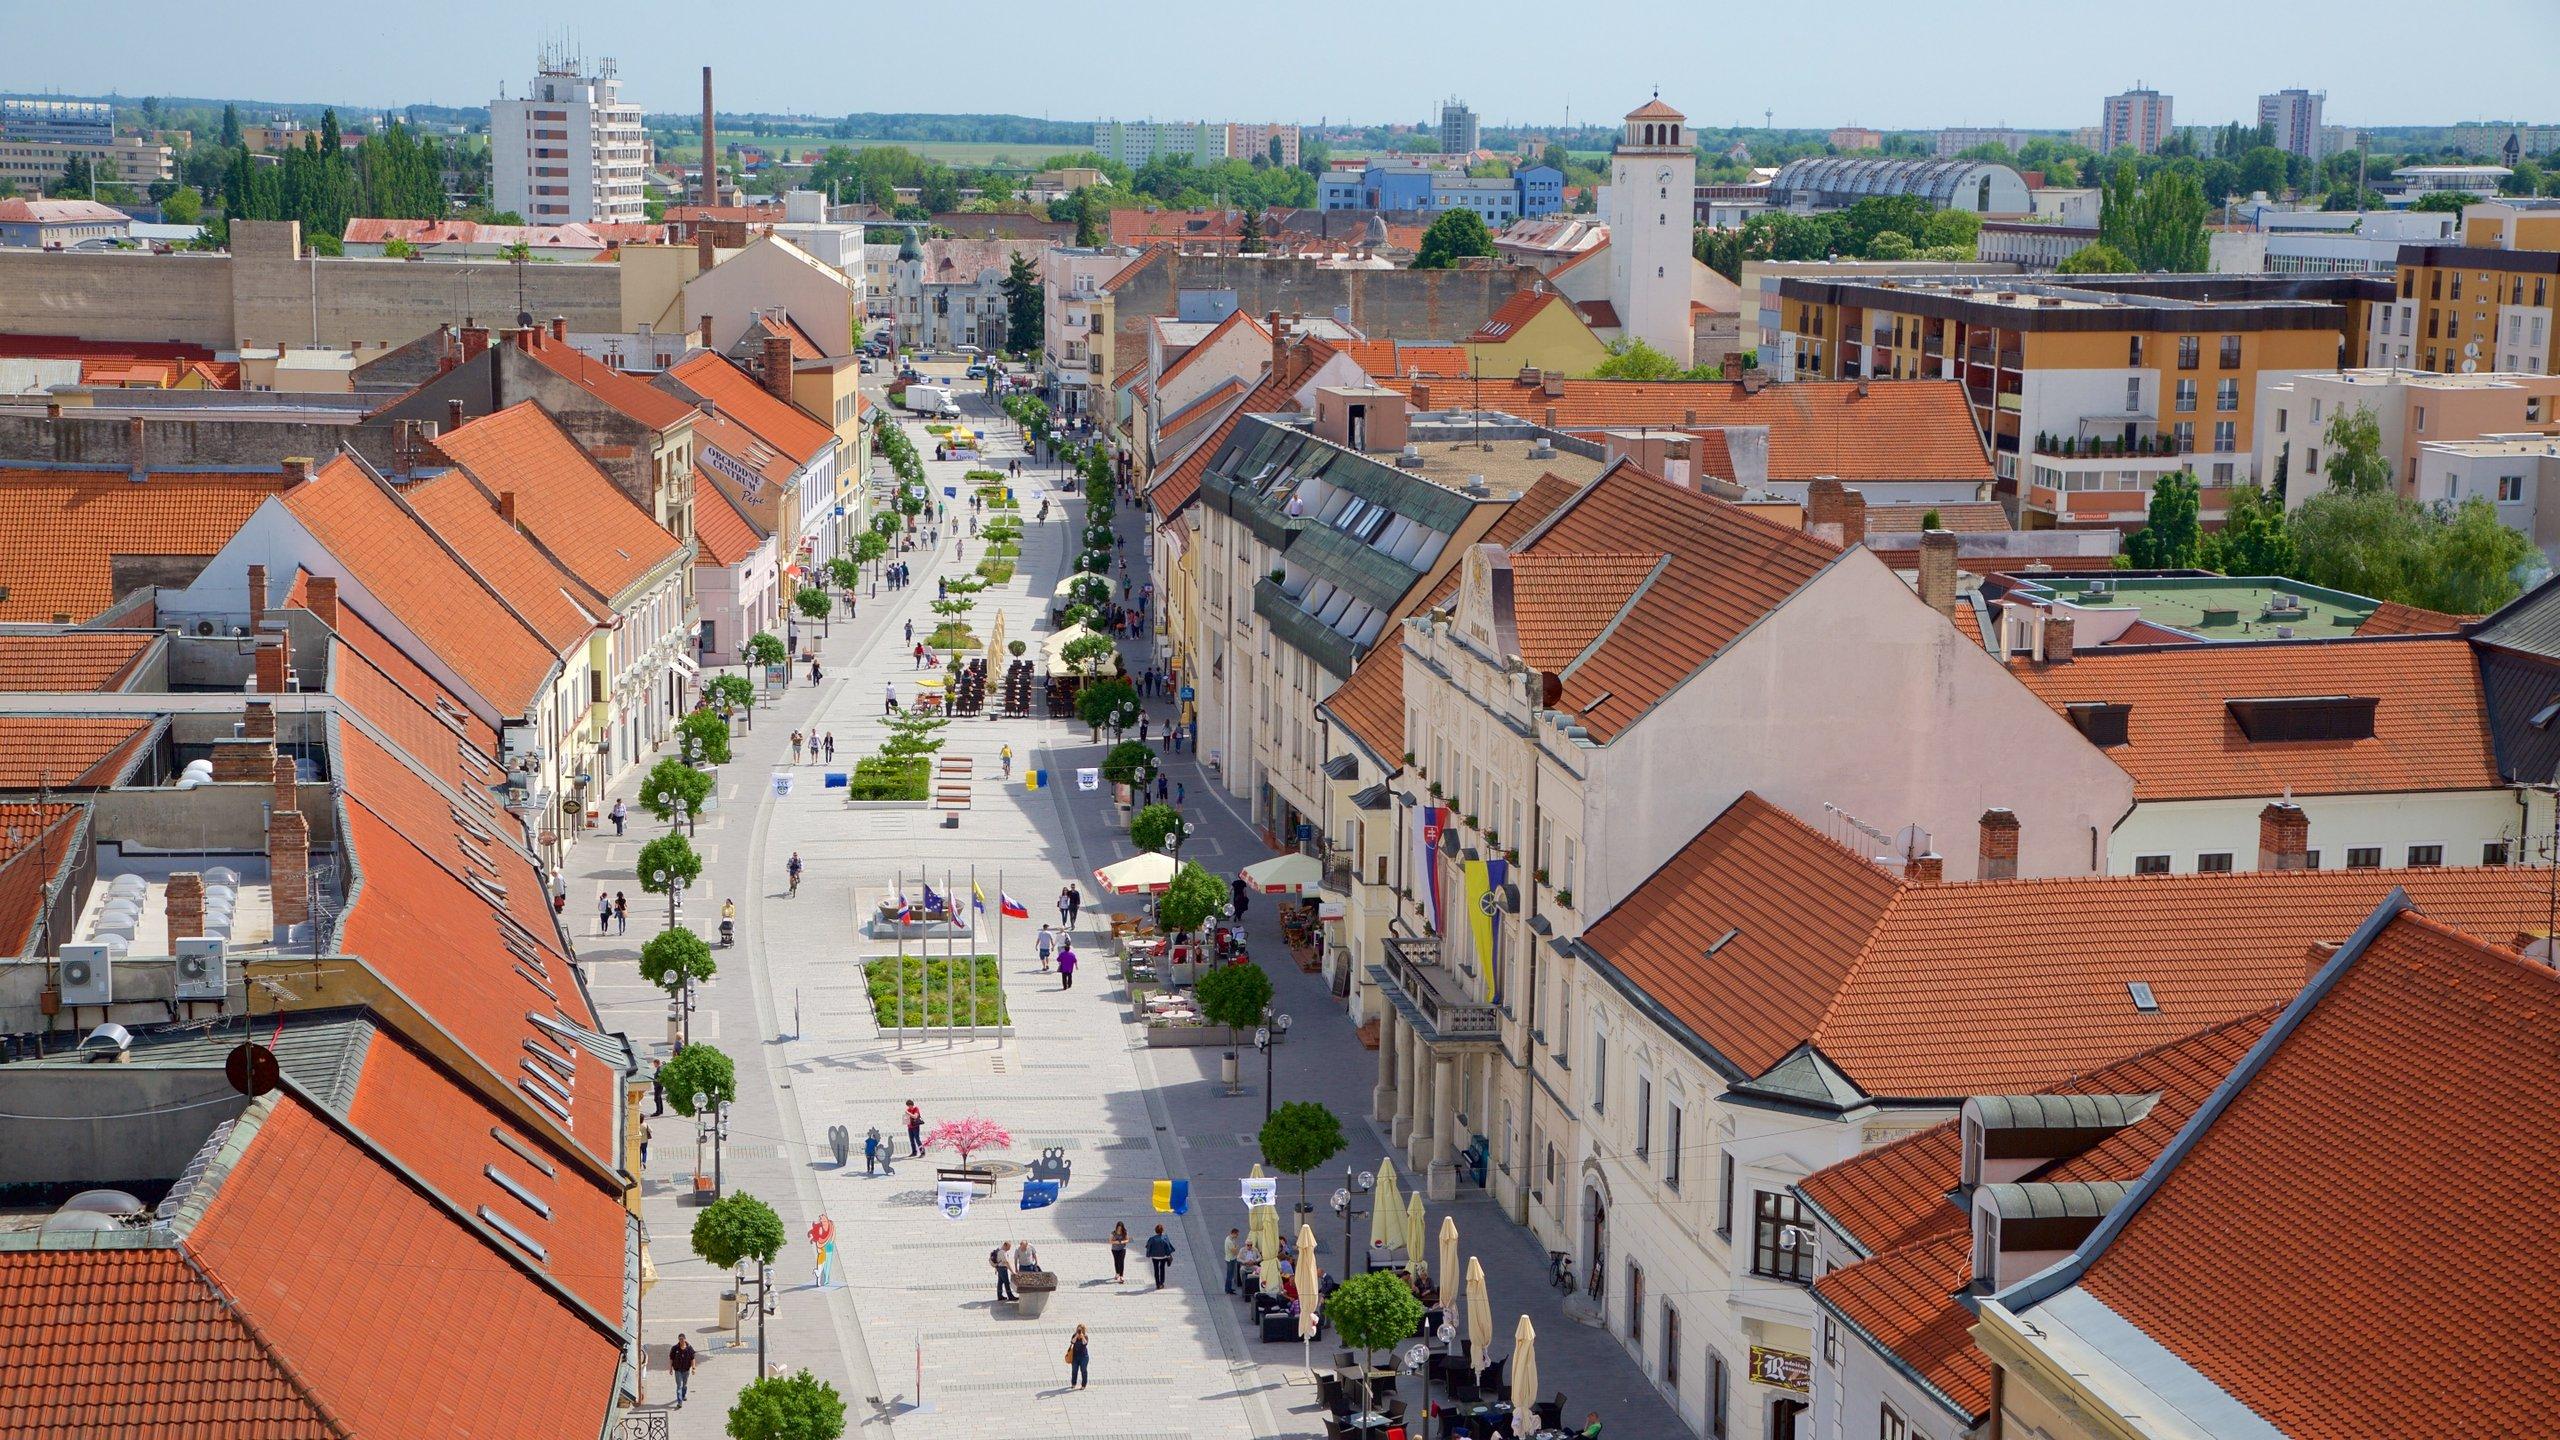 Trnava, Trnavský Kraj, Slovakia